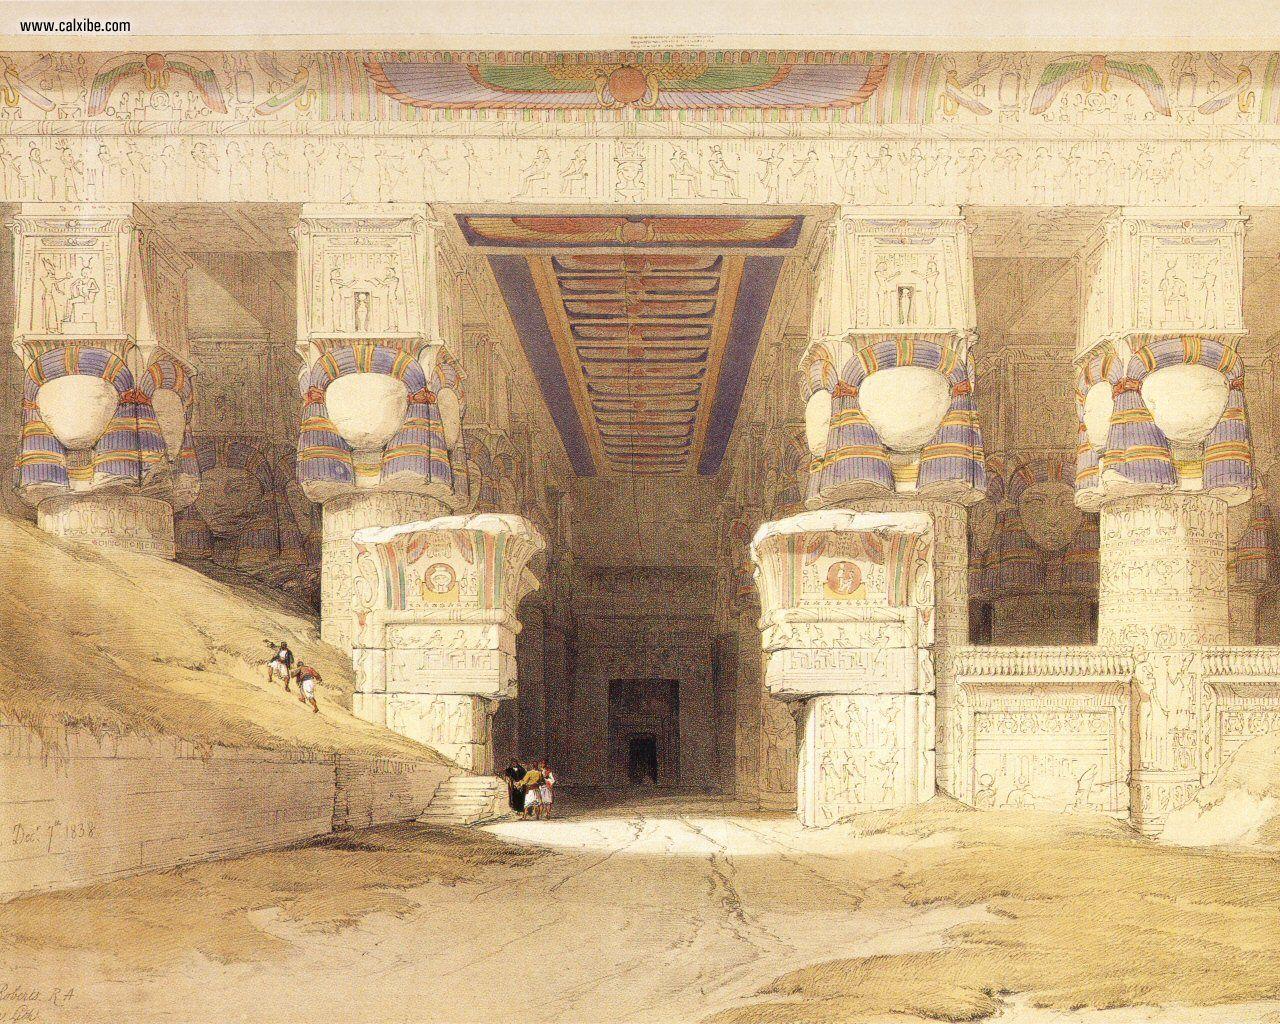 David_Roberts_pg06_The_Facade_Of_The_Temple_Of_Hathor_At_Dendera_